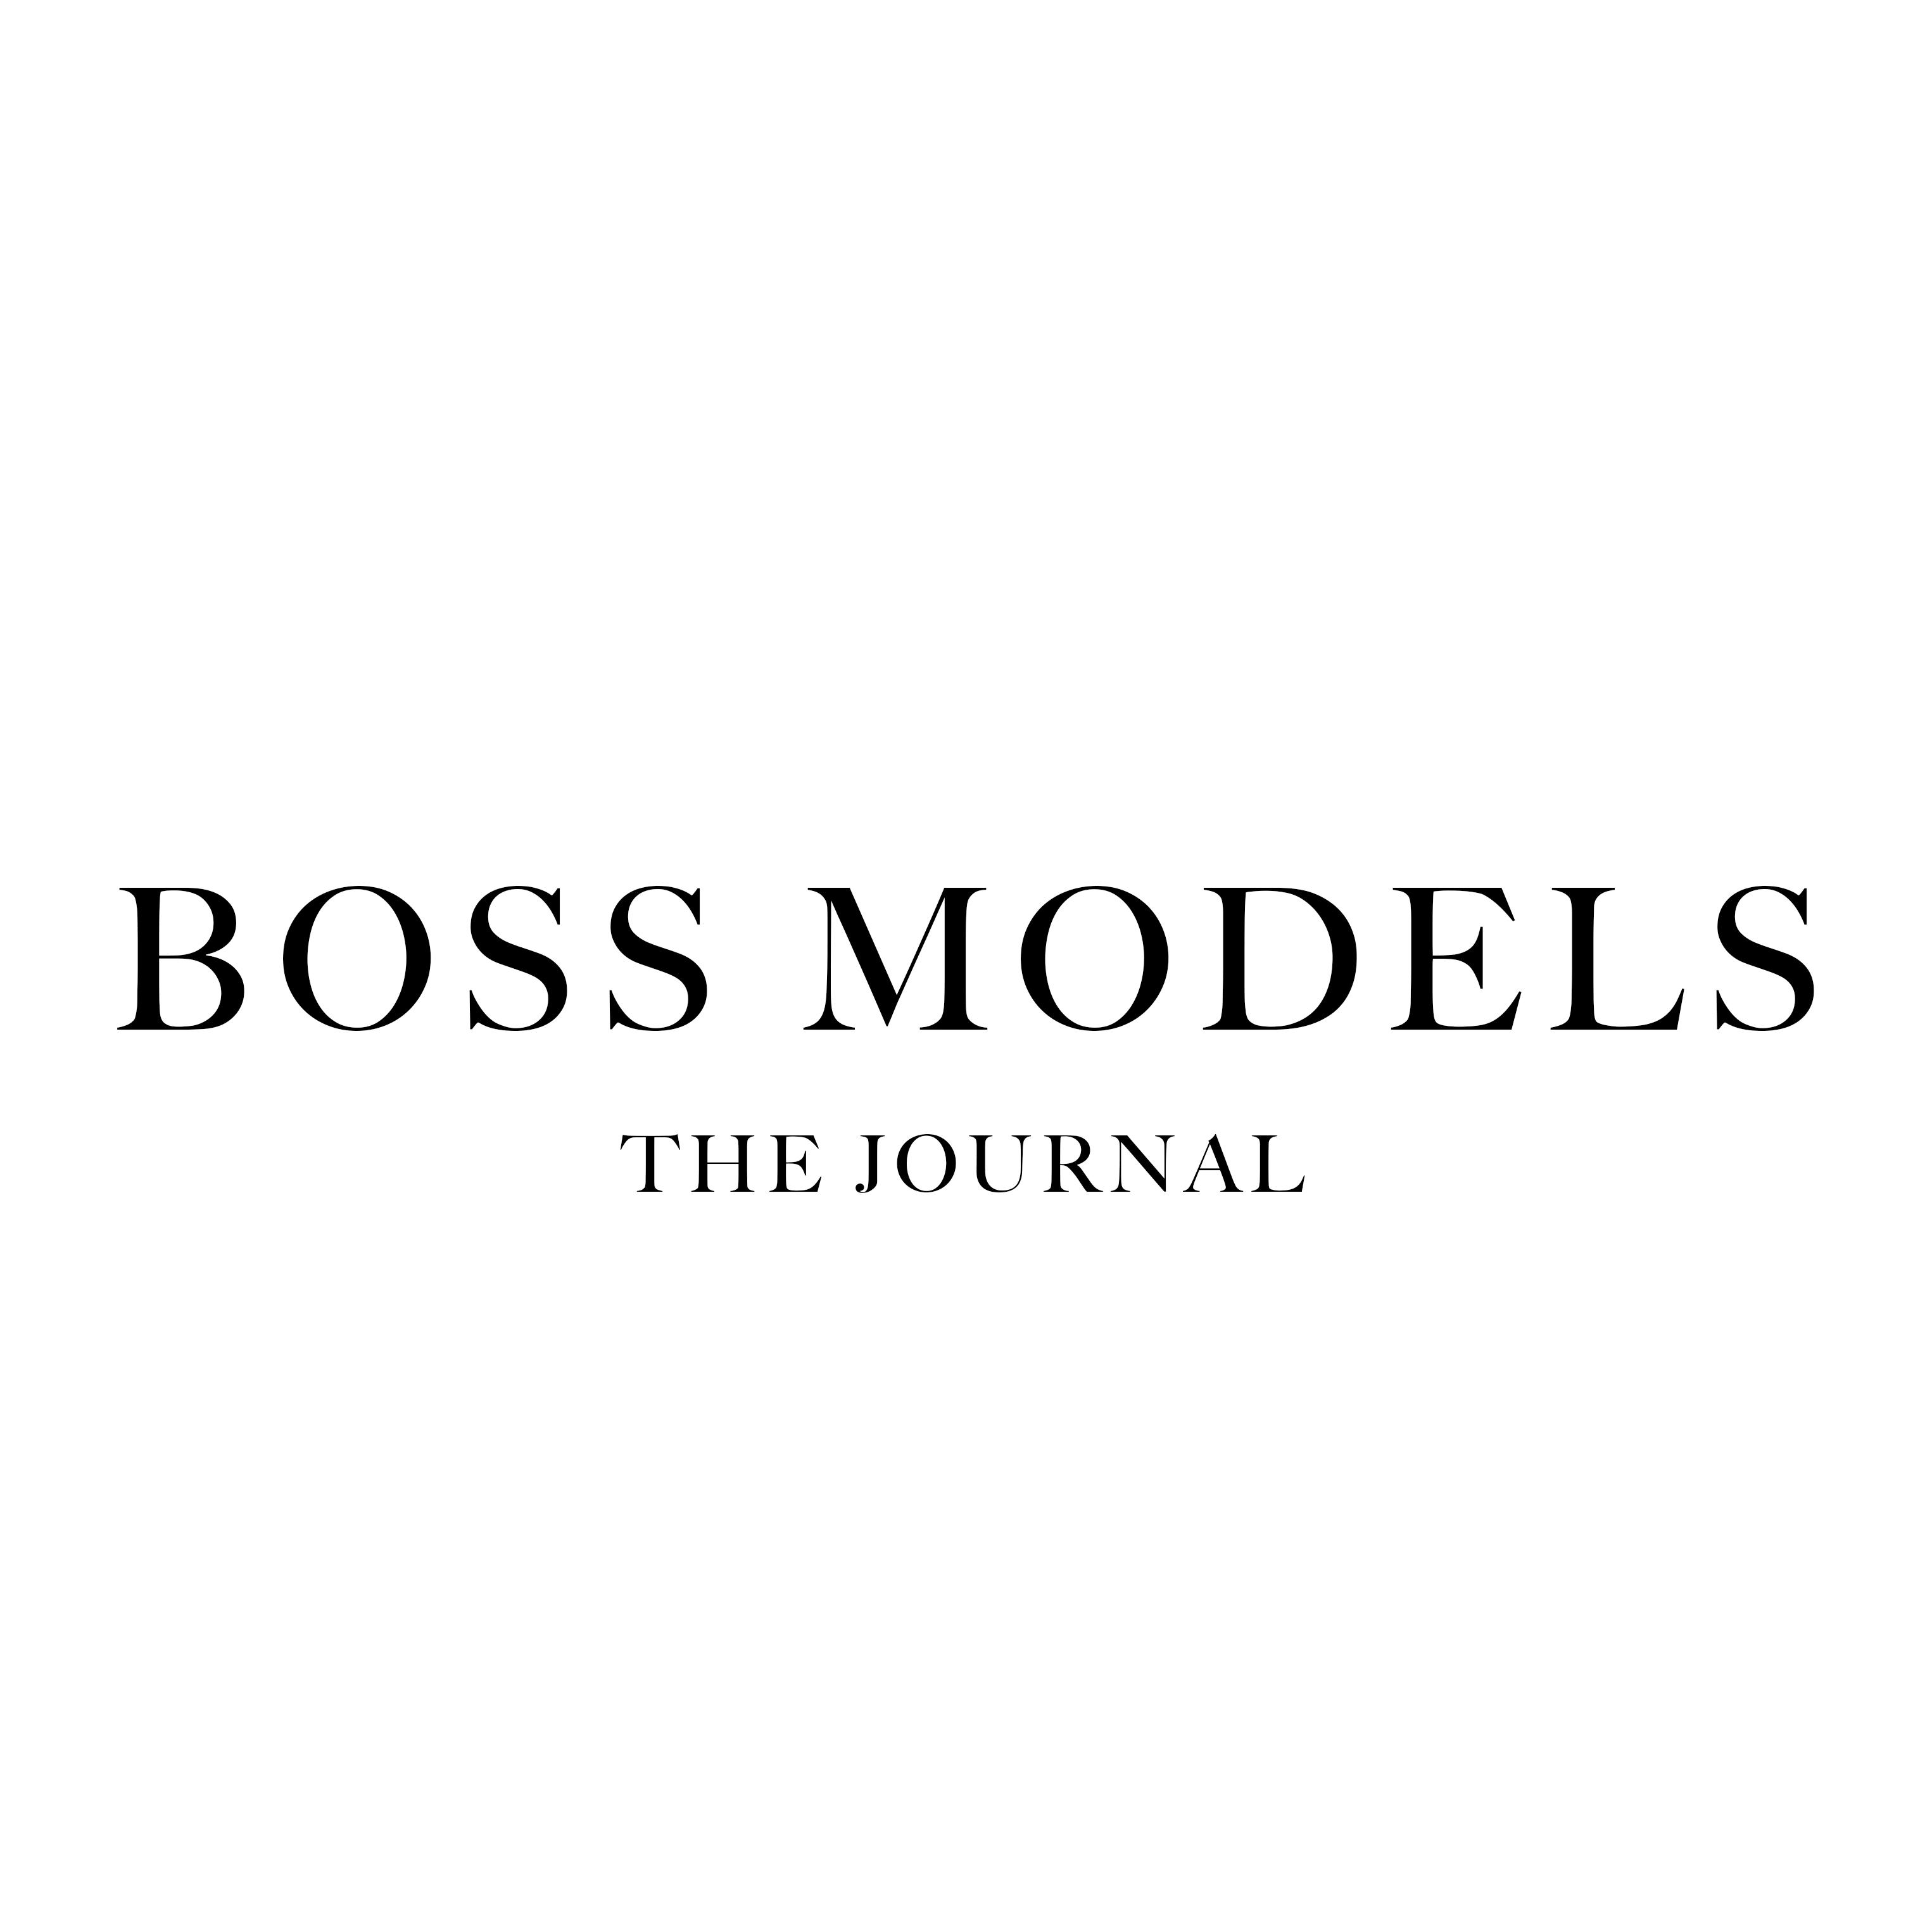 boss models the fcitw chrisna de bruyn describe your boss models